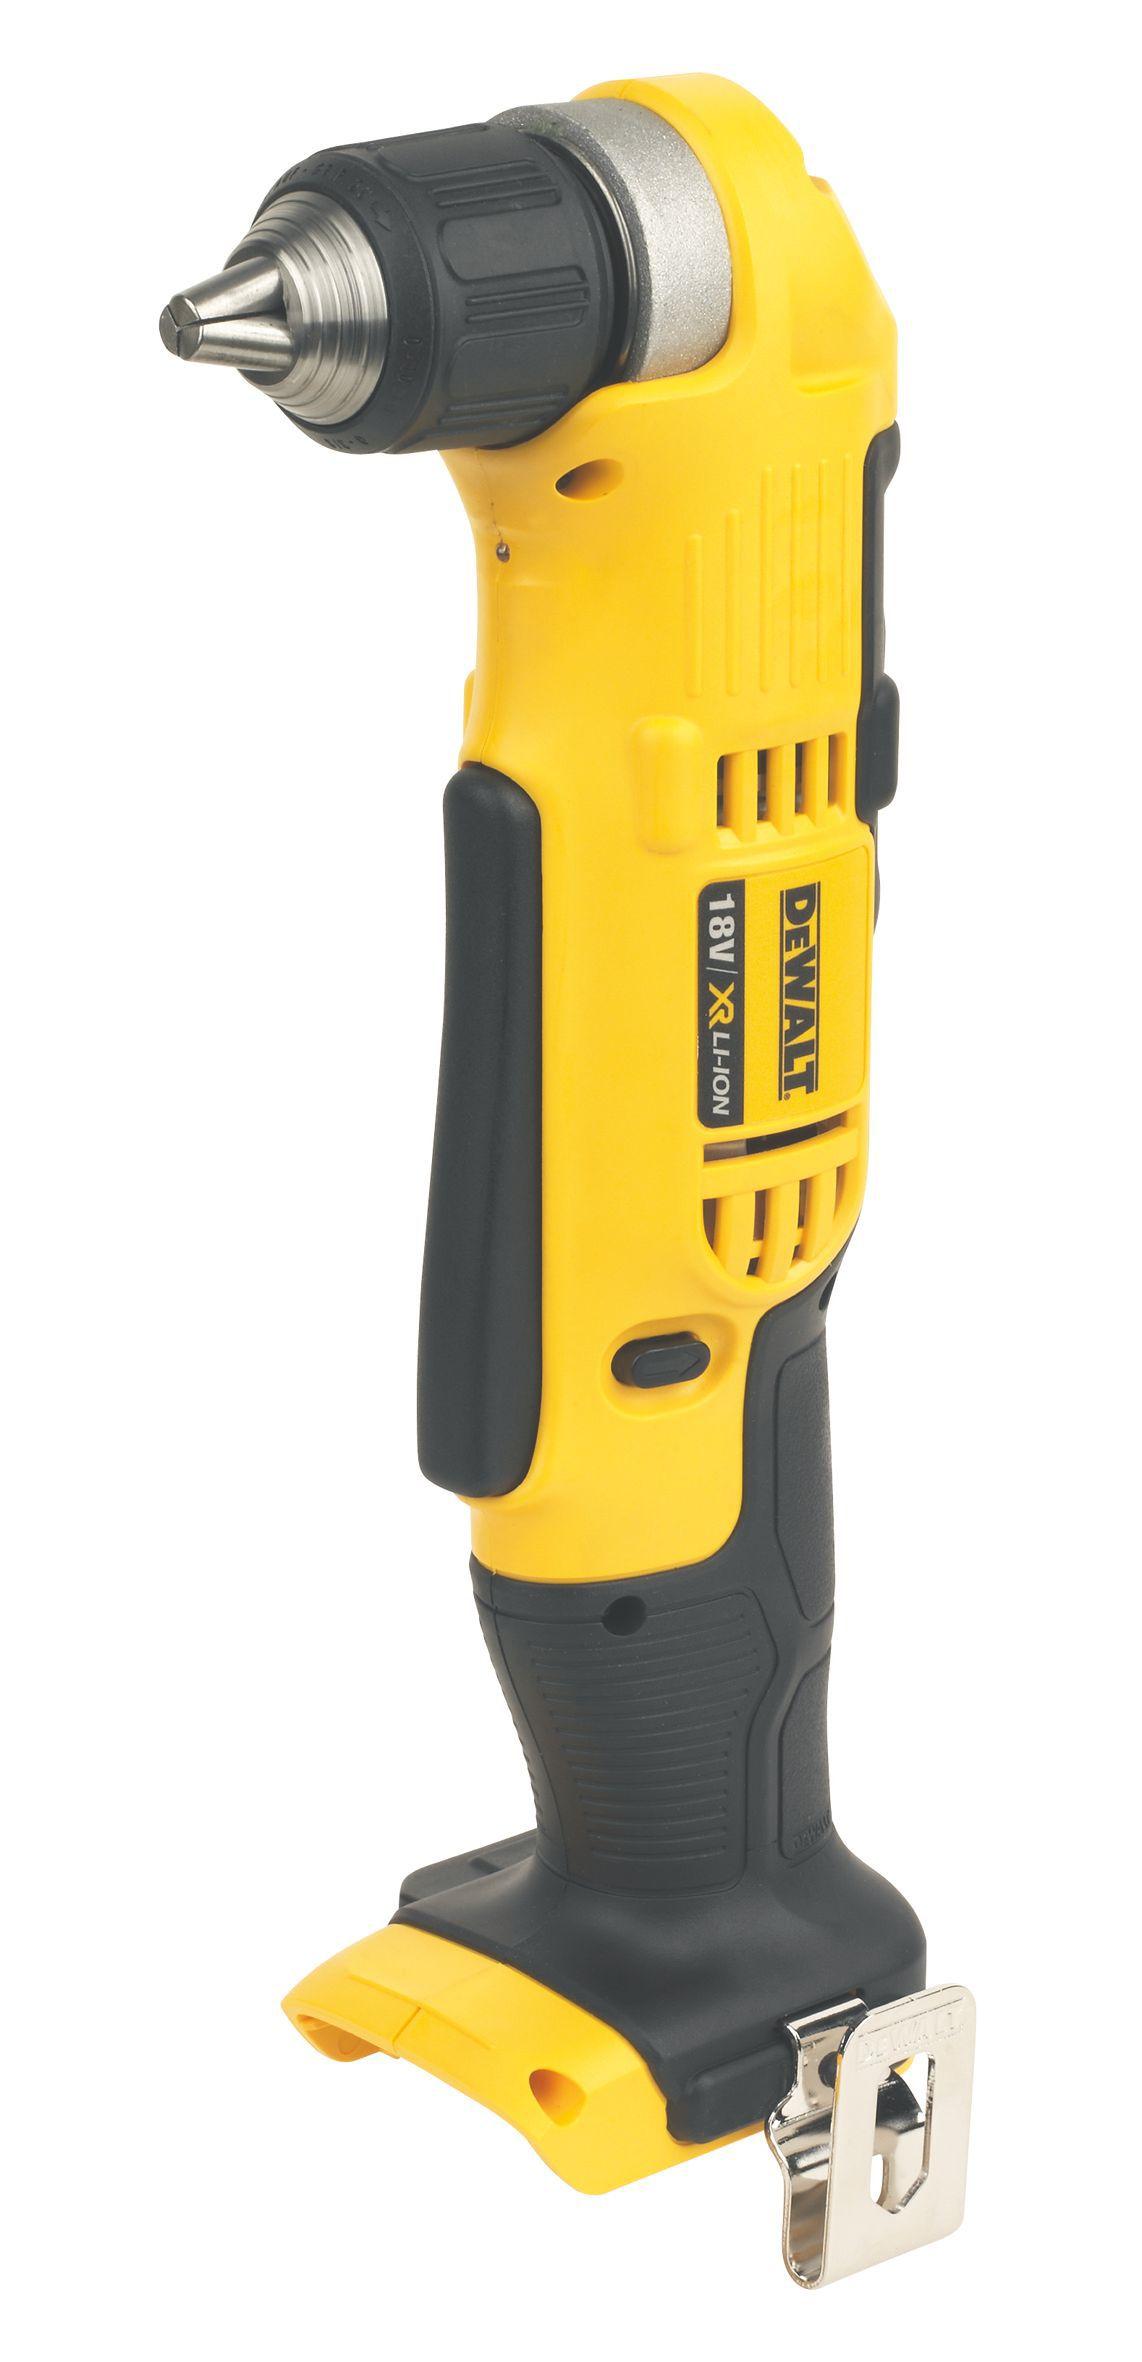 Dewalt Xr Cordless 18v Angled Drill Driver Dcd740n-xj - Bare